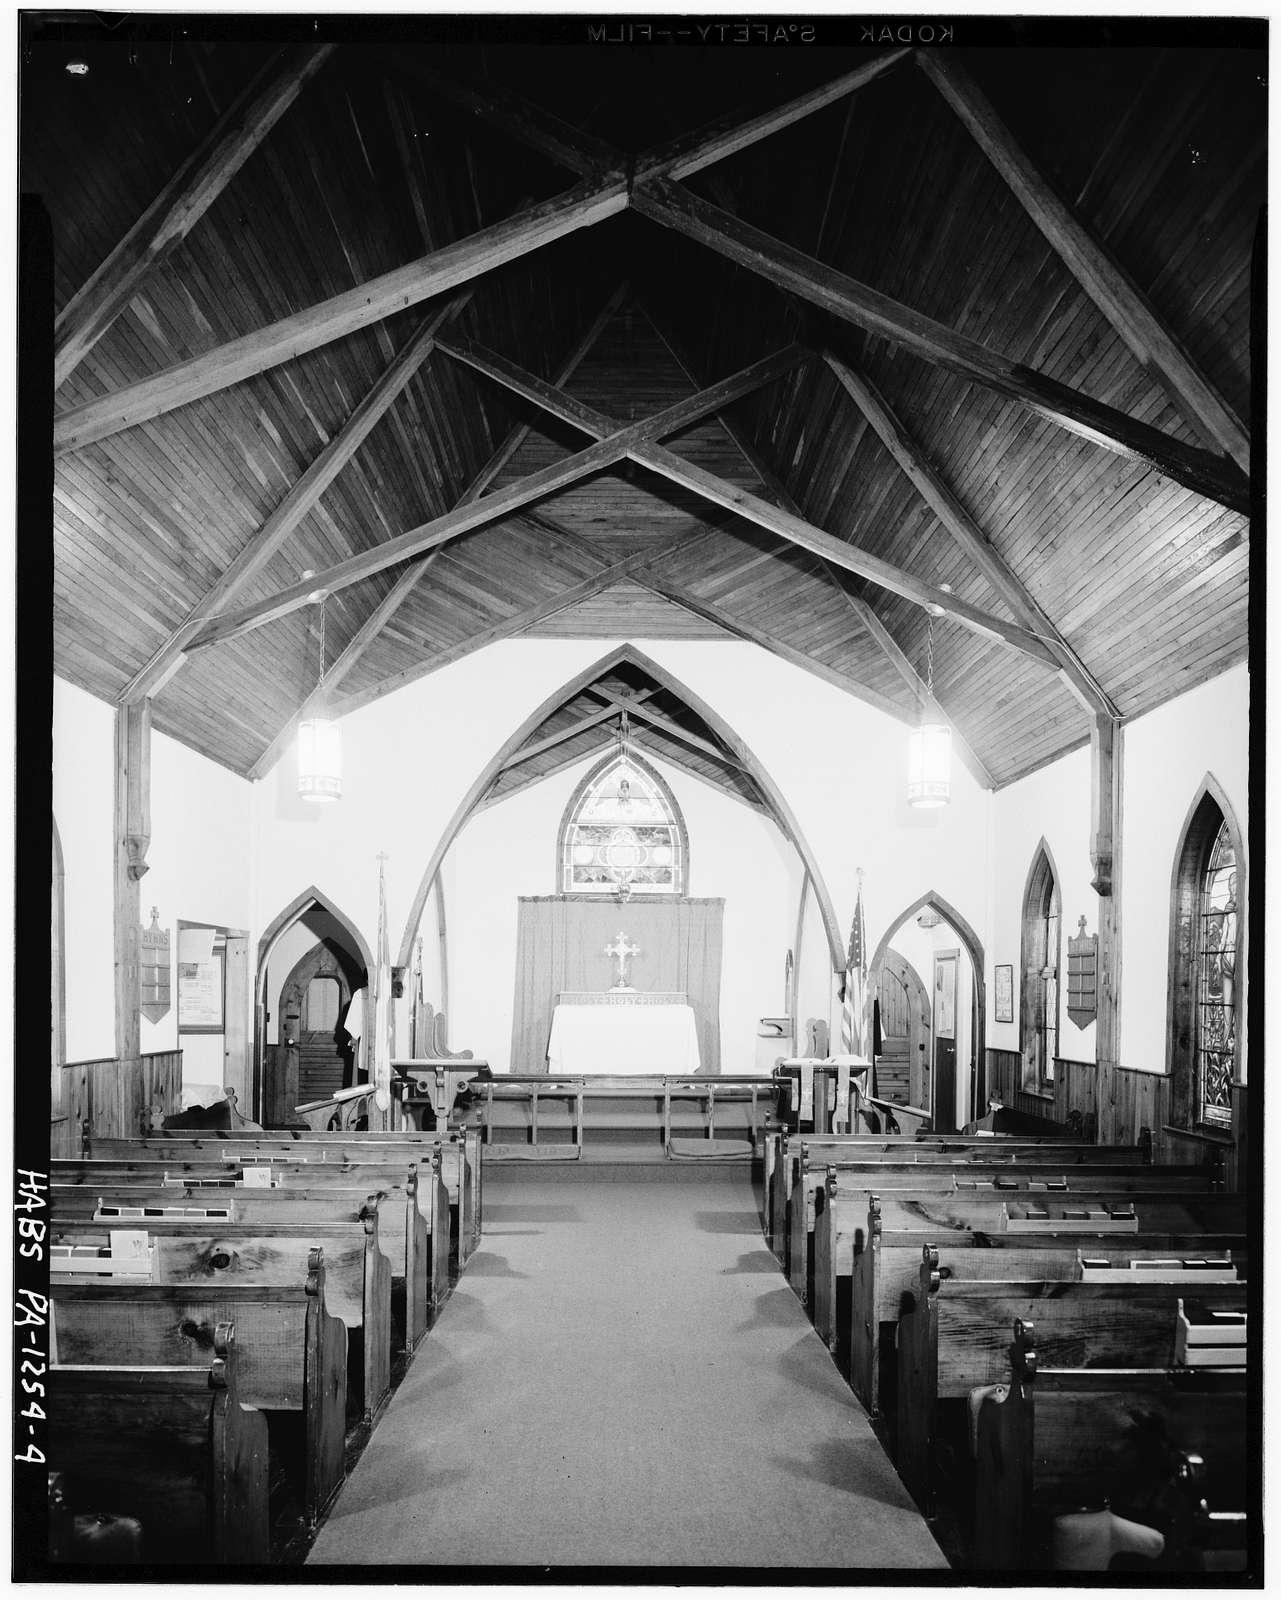 St. John the Evangelist Episcopal Church, Dingmans Ferry, Pike County, PA